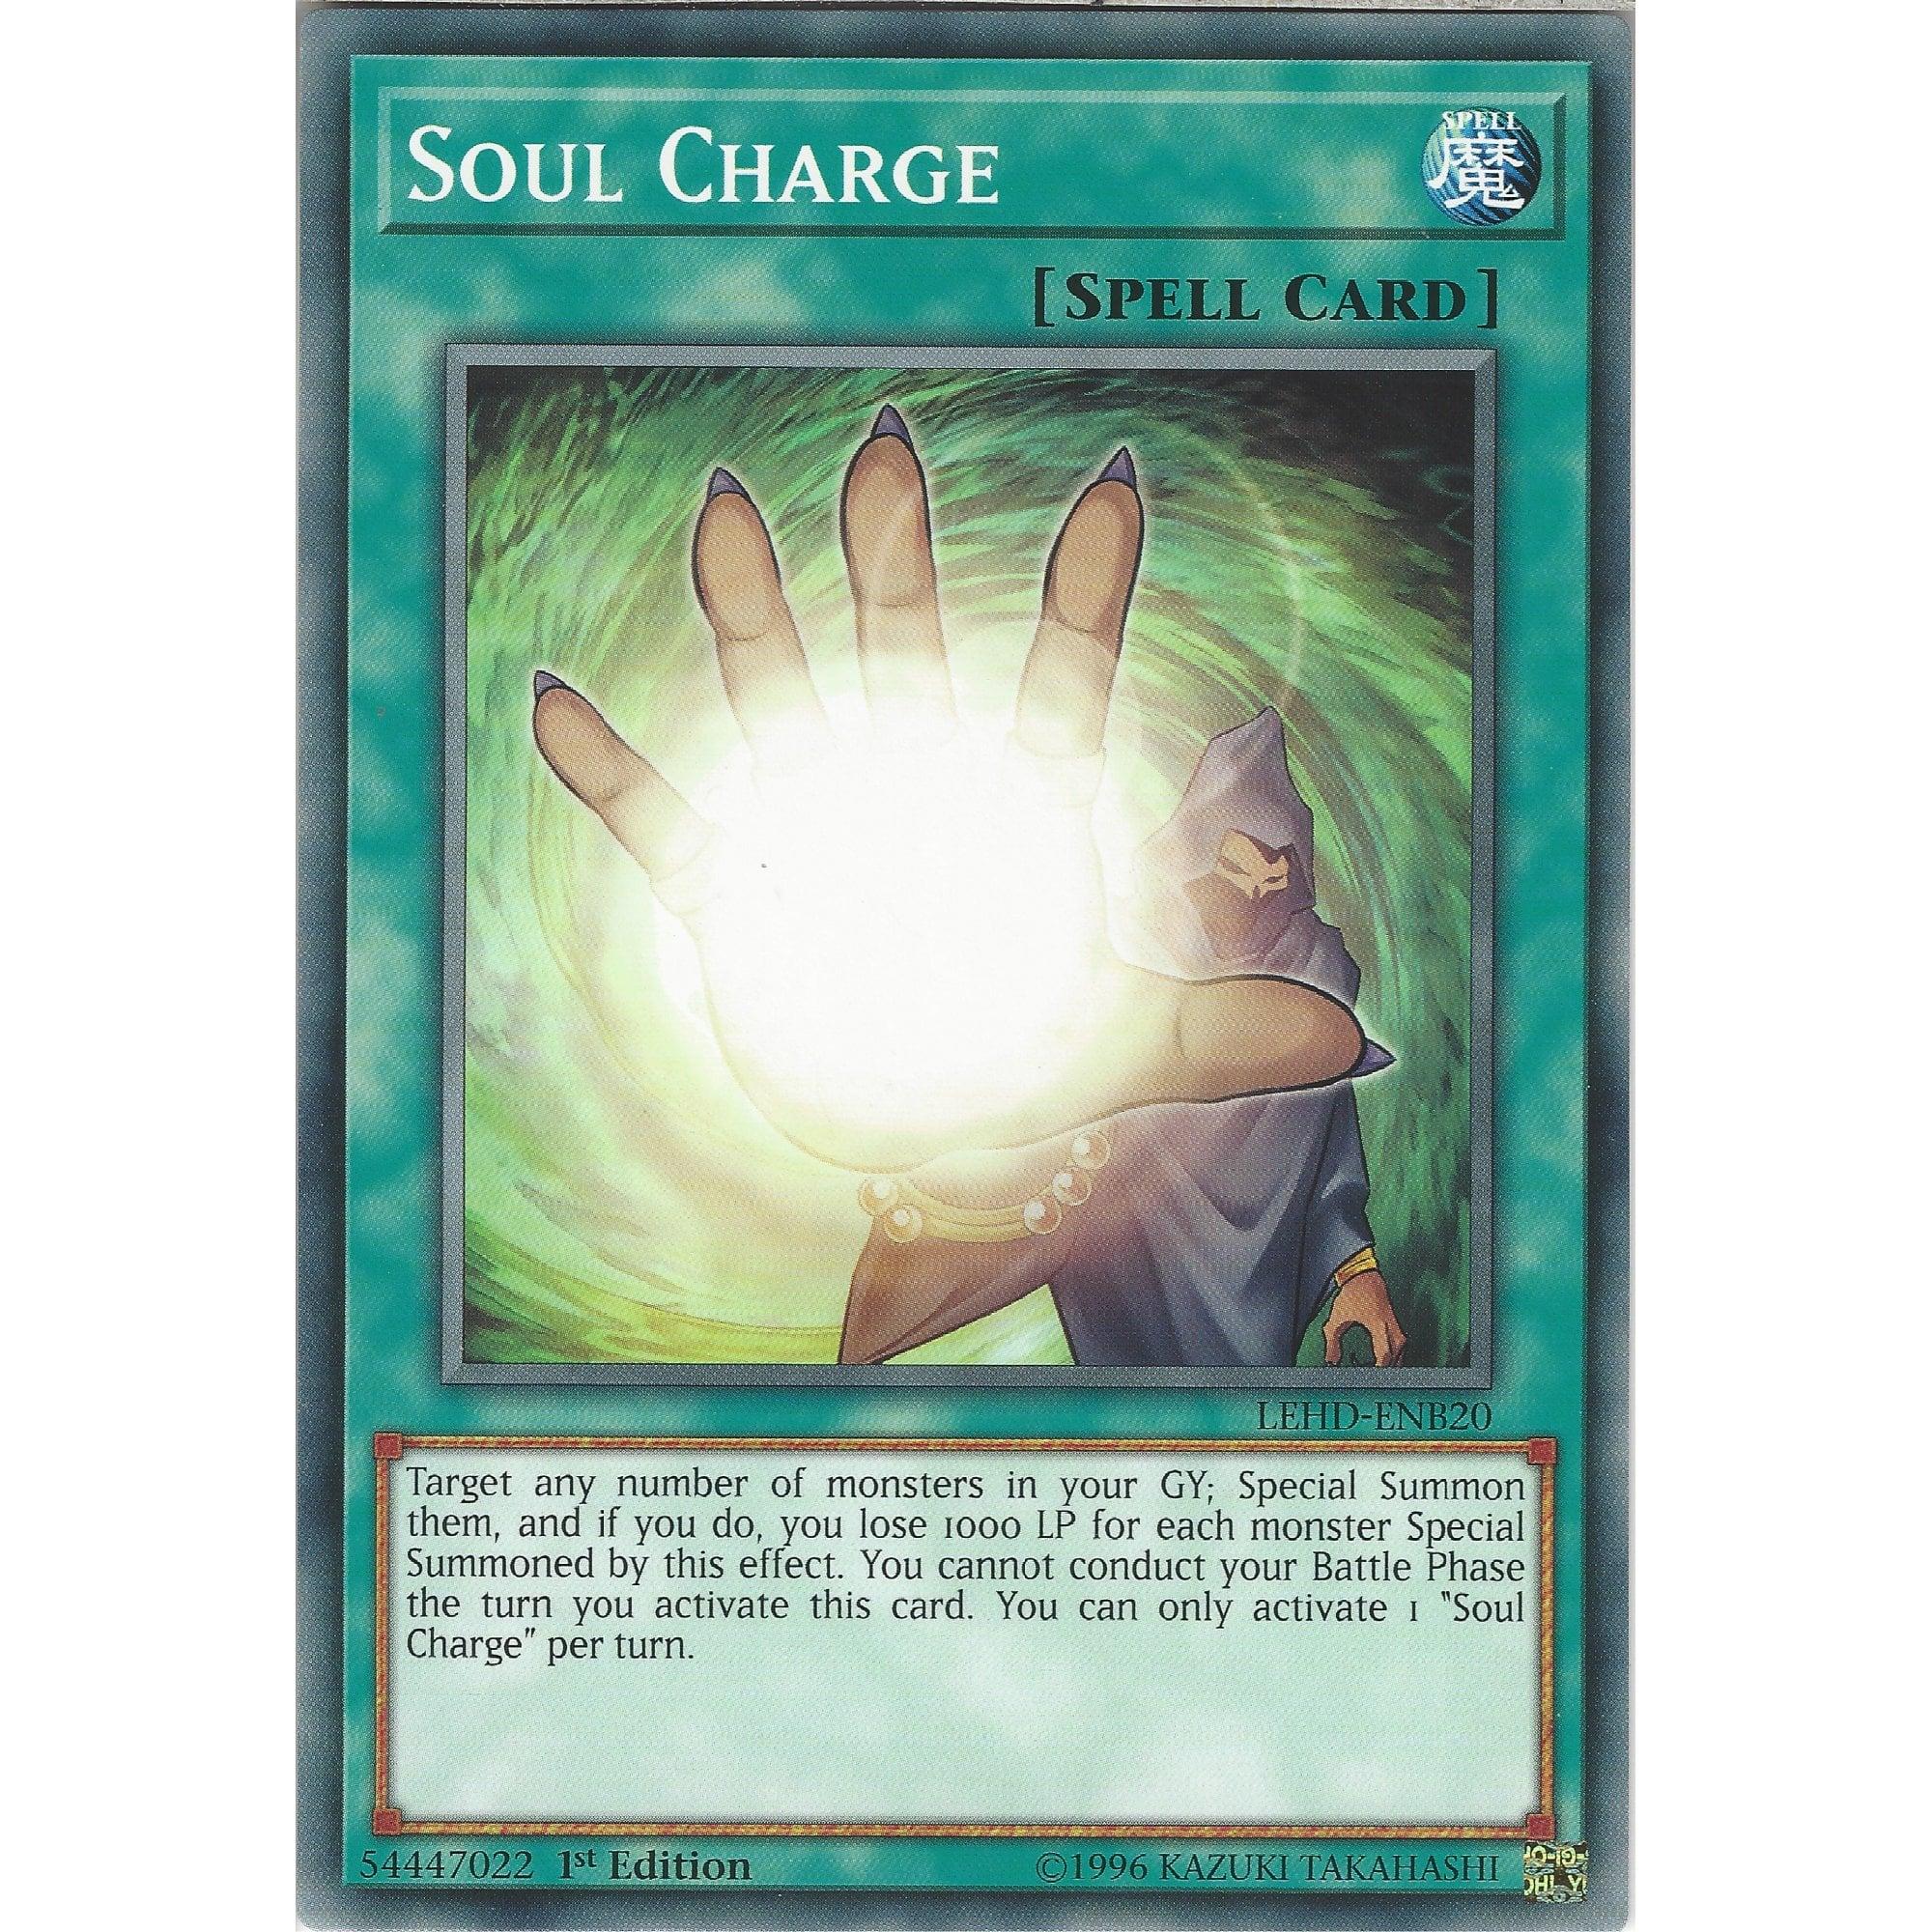 near Mint YuGiOh!! Soul Charge lehd-ENB20 common 1st!